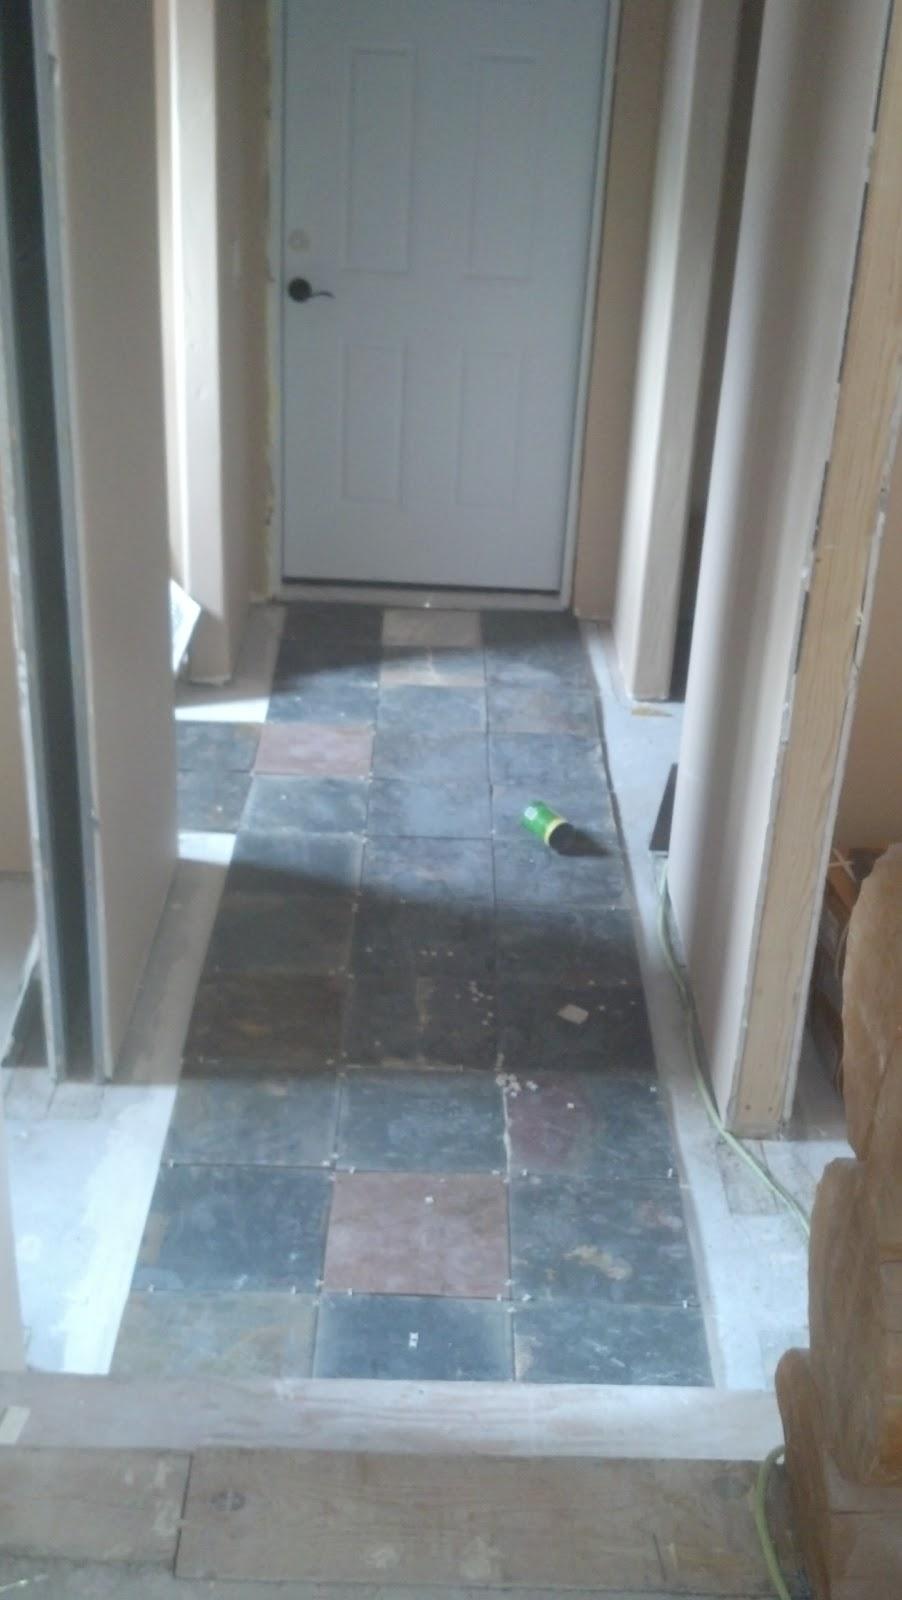 Stannard Log Home: Floor Tiles